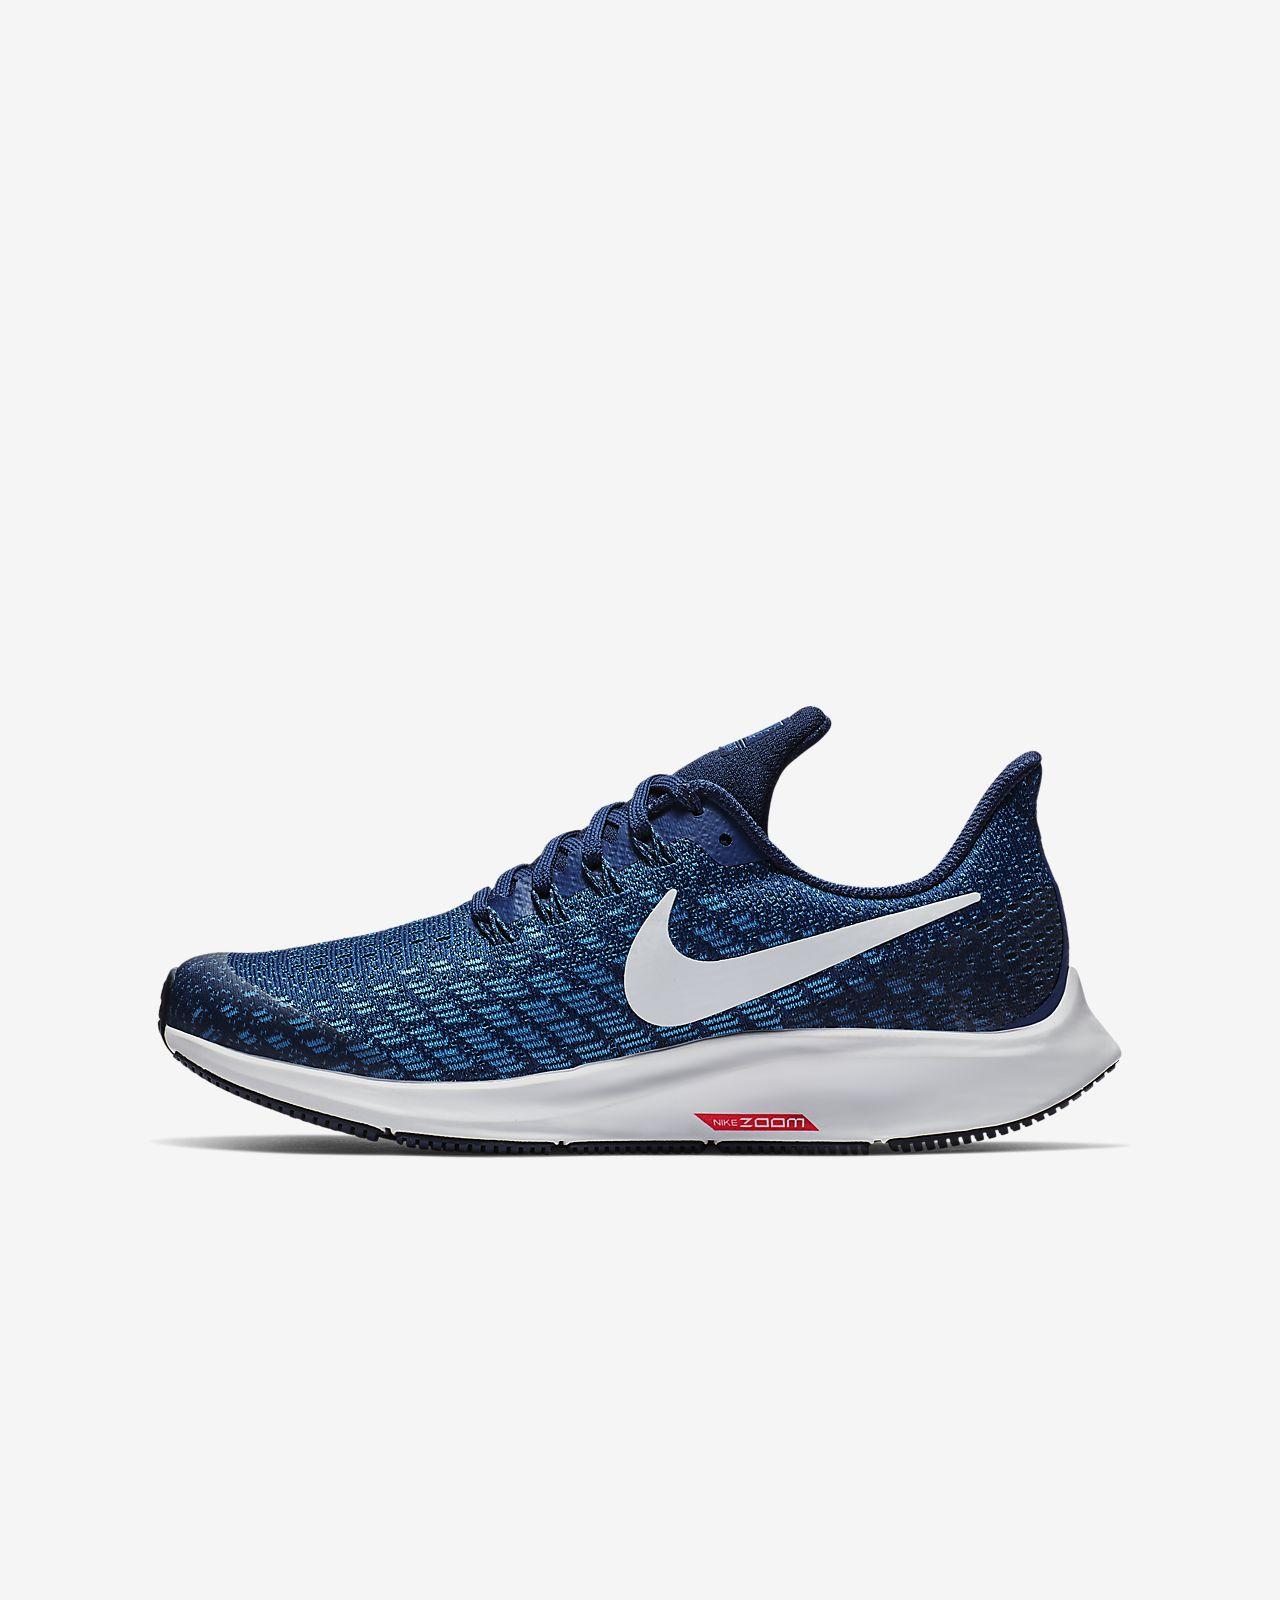 Scarpa da running Nike Air Zoom Pegasus 35 - Bambini/Ragazzi